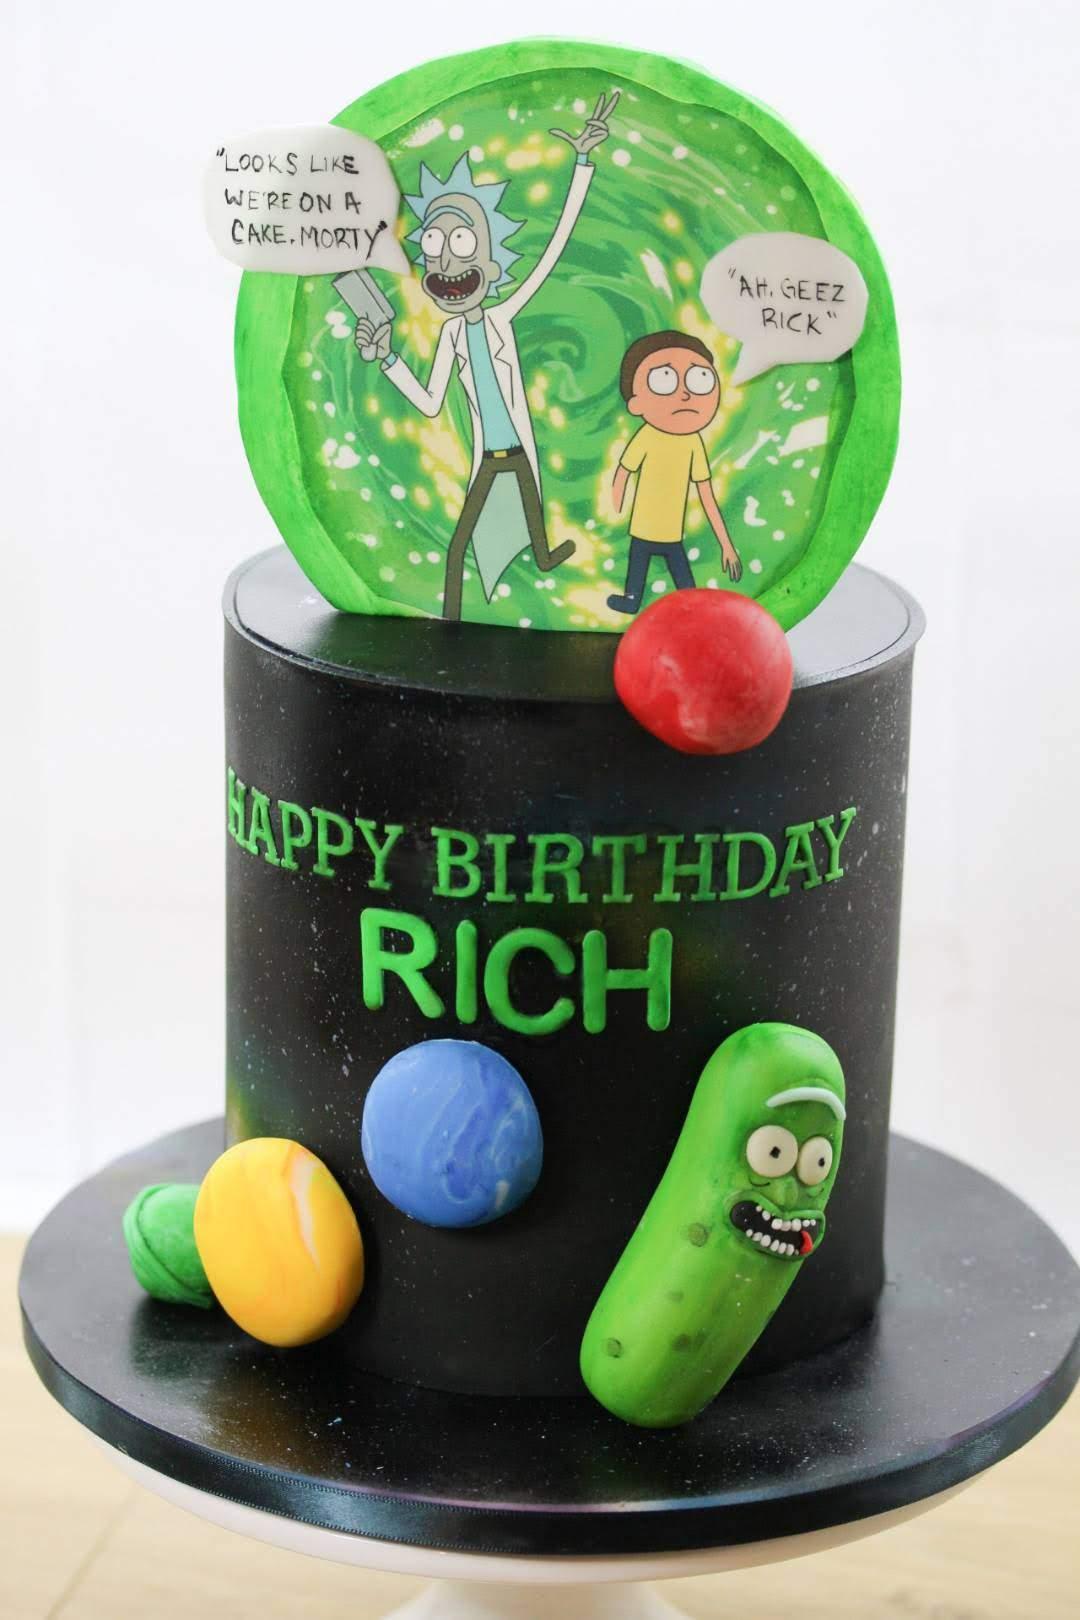 Rick and Morty cake